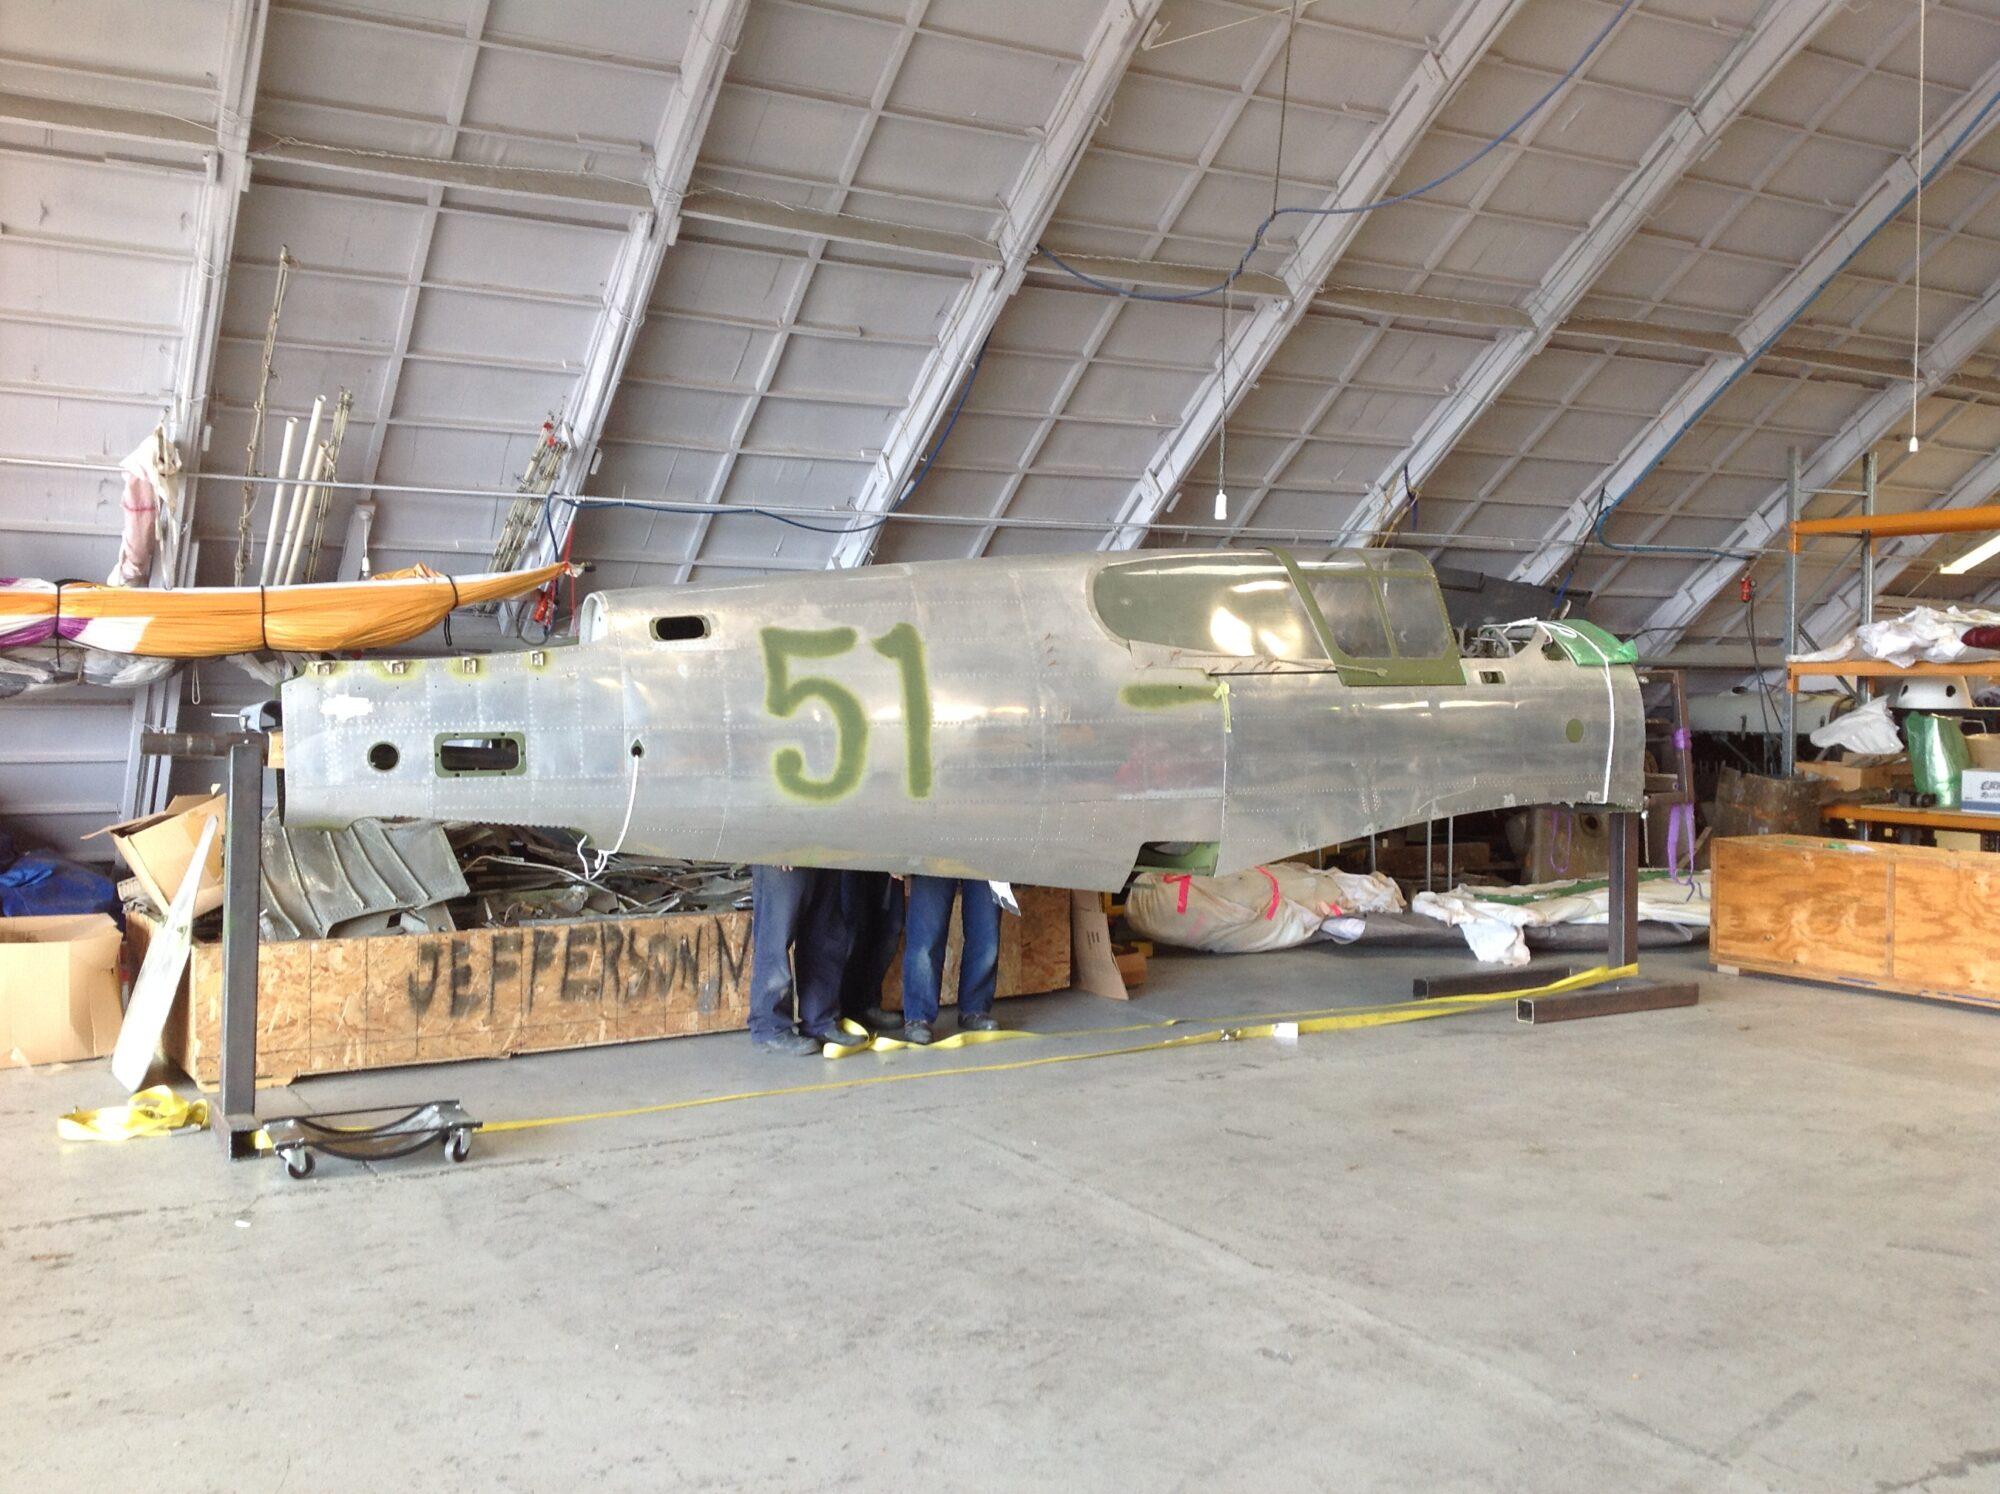 Curtiss P-40E 41-13570 ( Photo © Pioneer Aero Ltd )